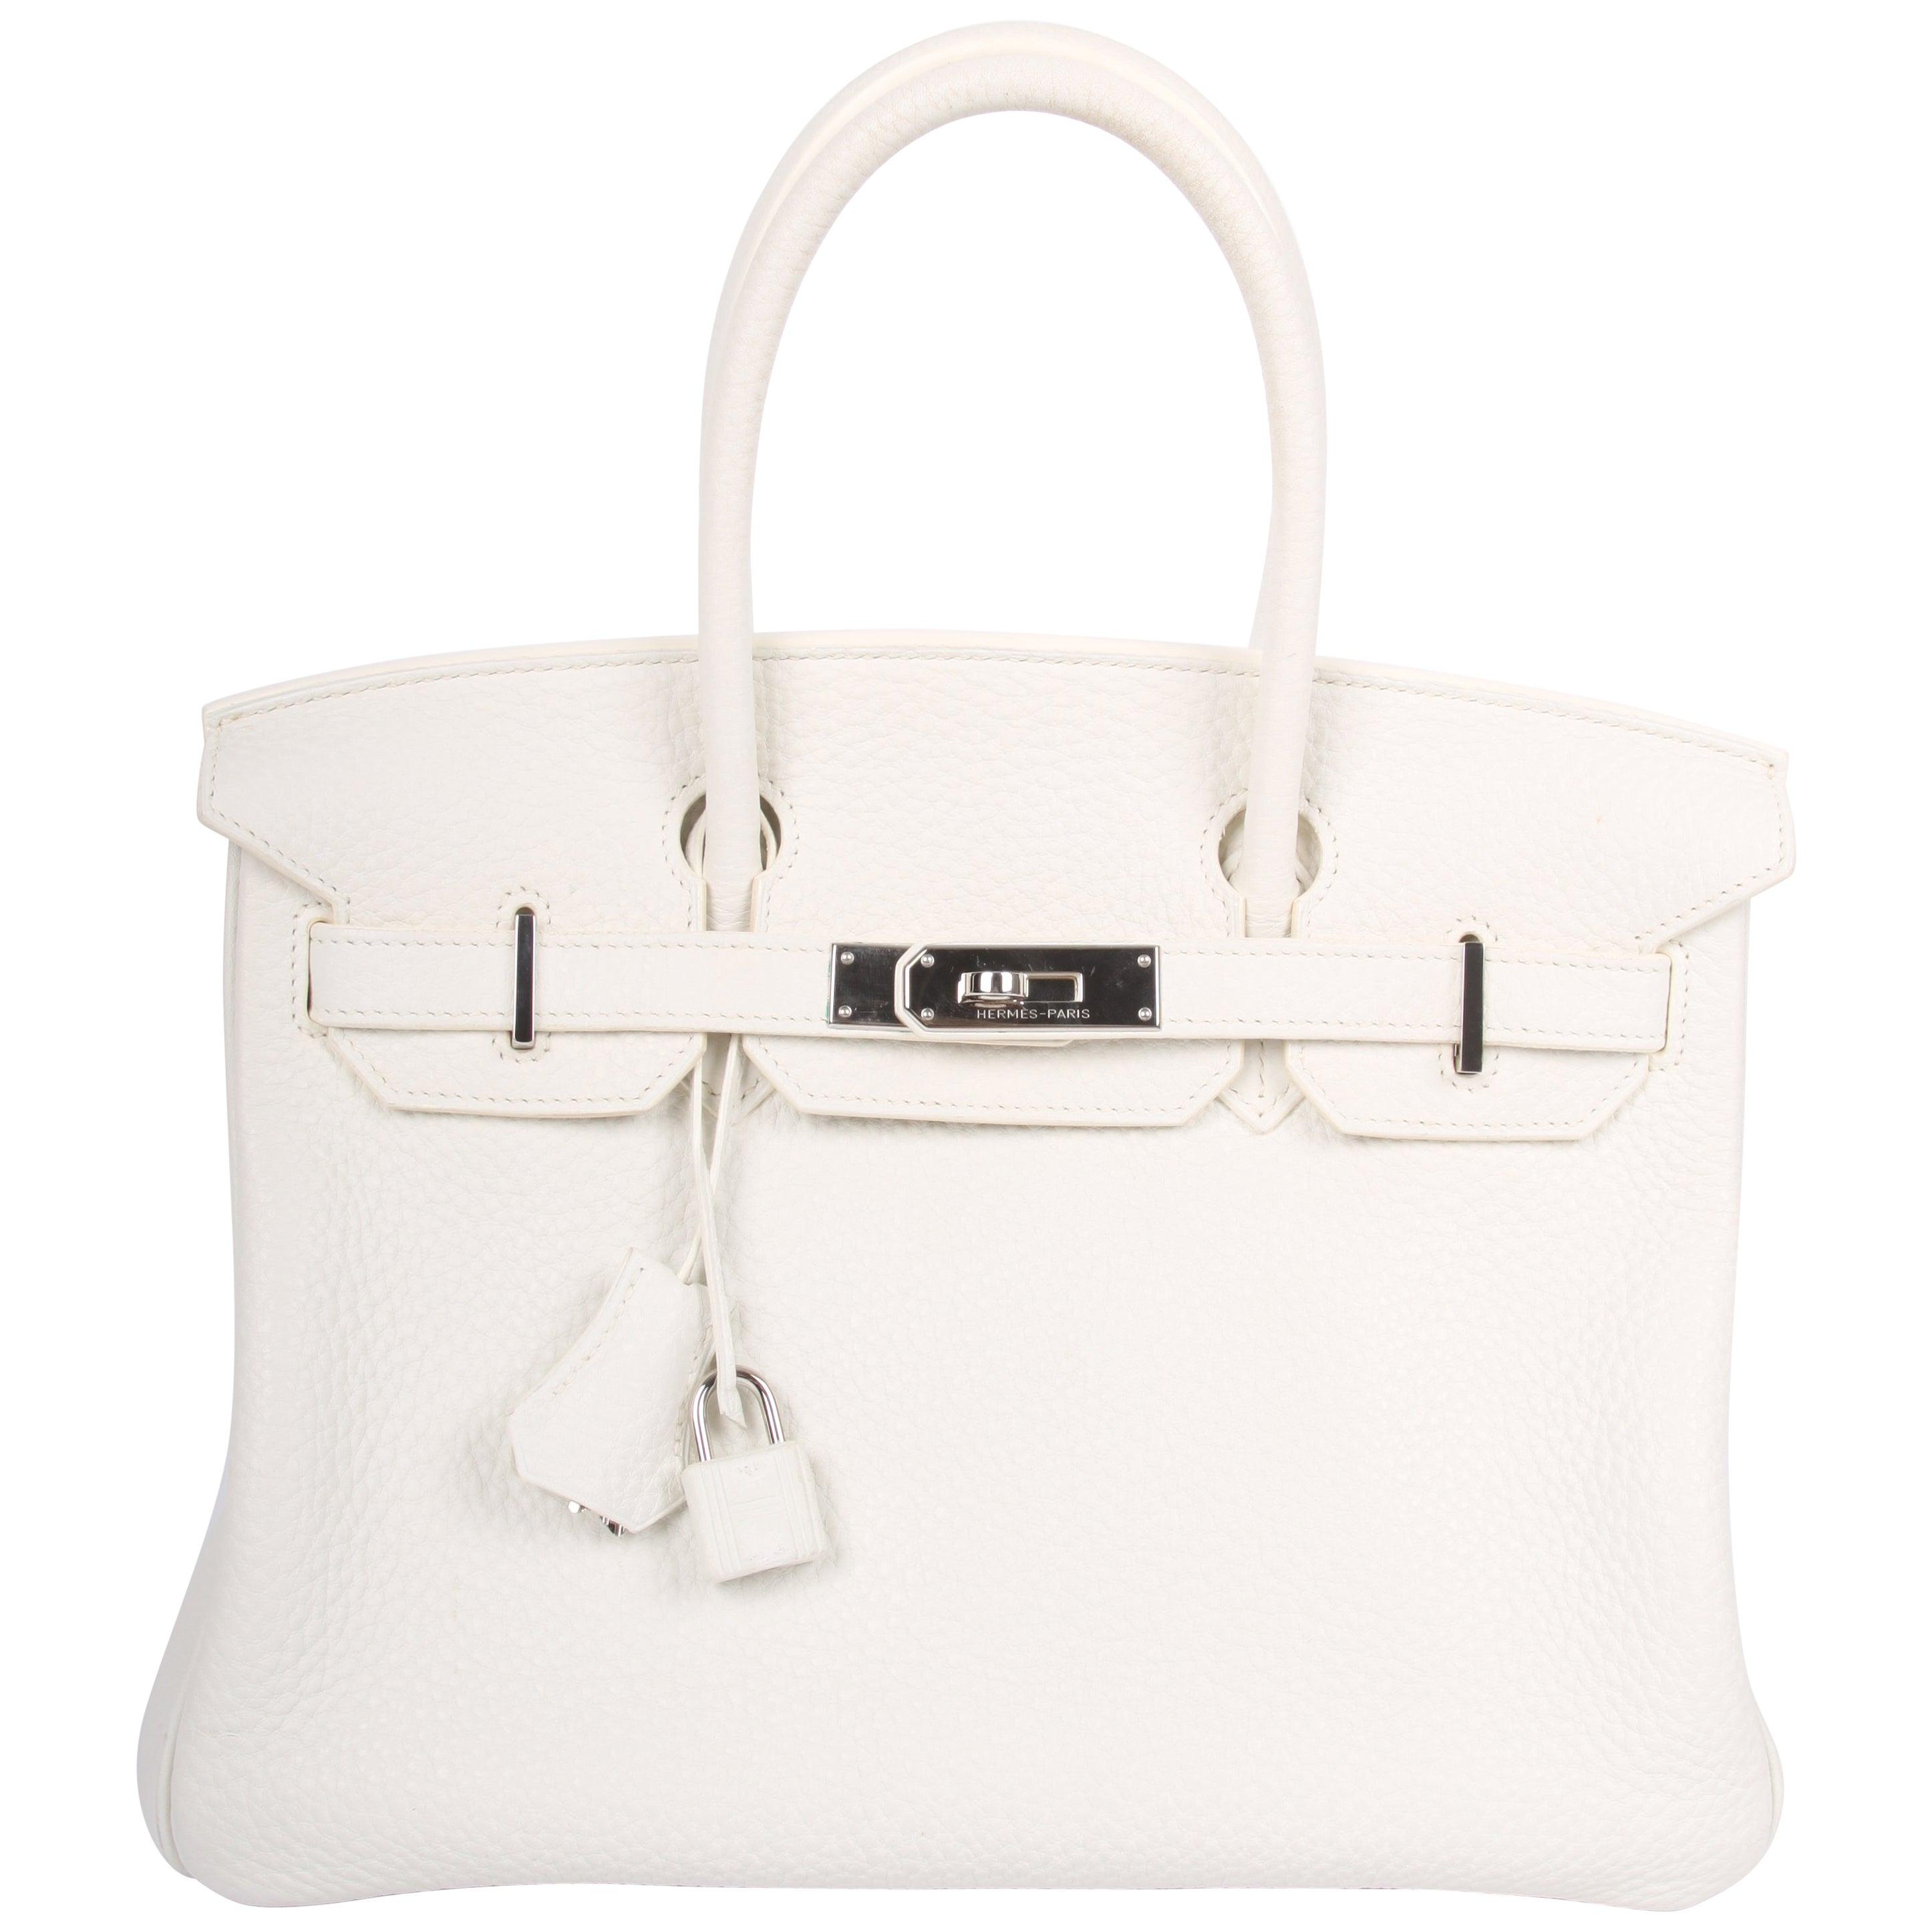 11c7cac120 Hermes white Birkin 30 Bag at 1stdibs